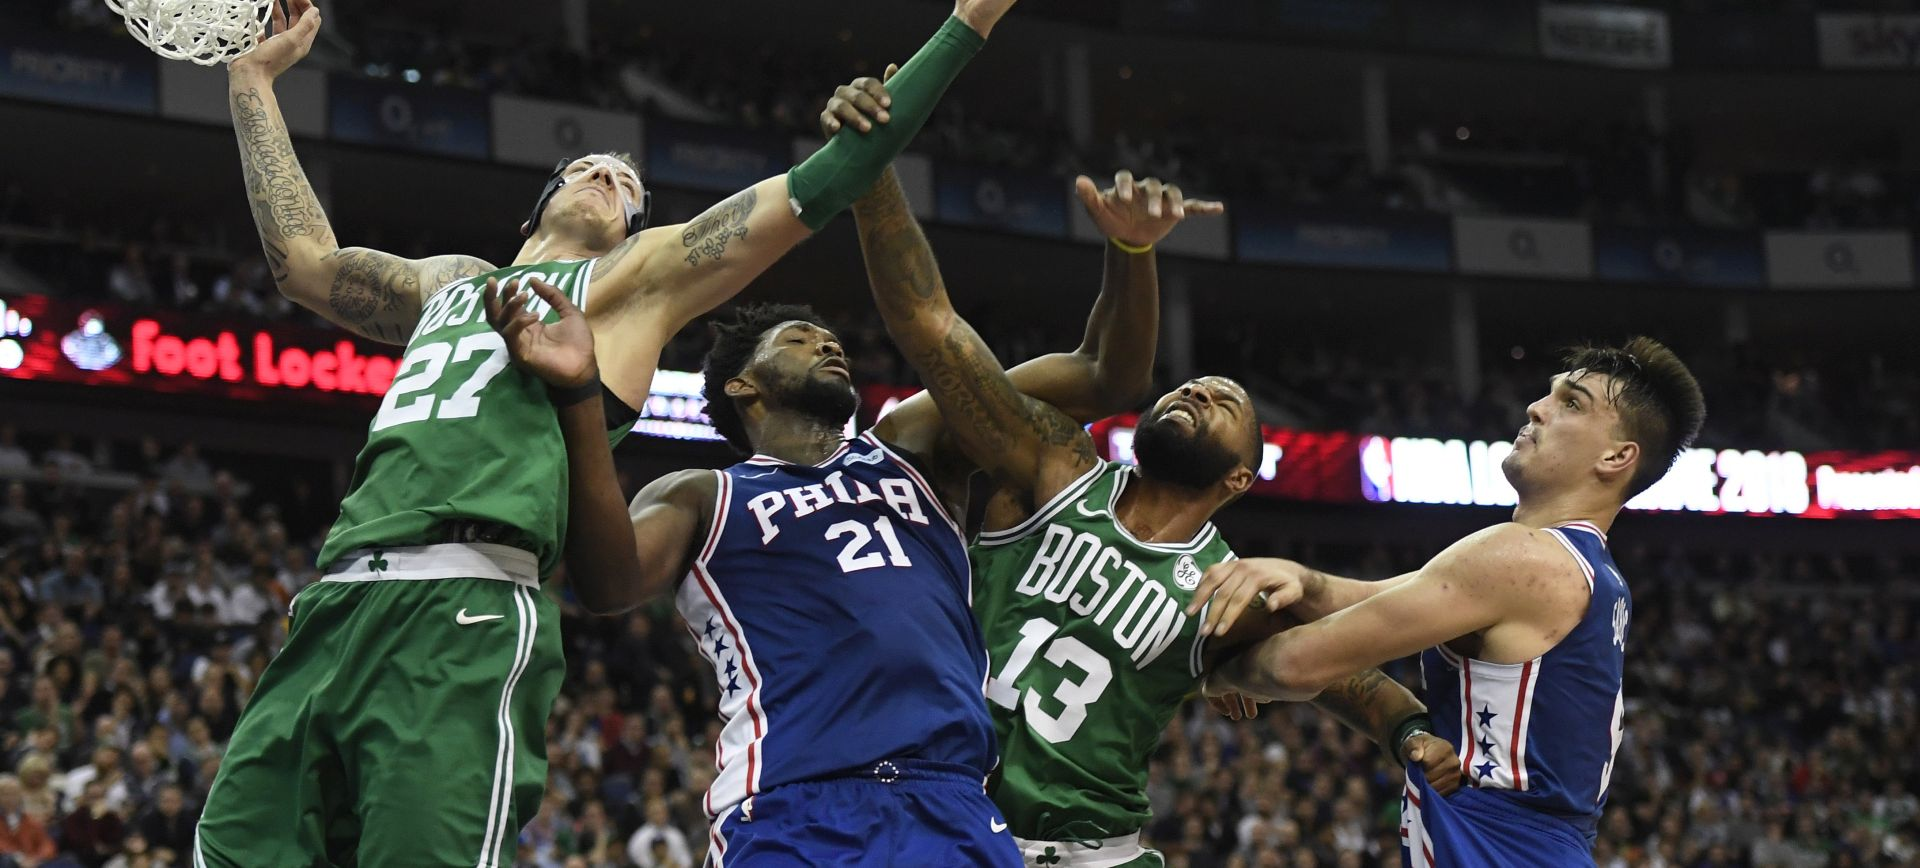 NBA Philadelphia nadoknadila 24 razlike za pobjedu protiv Miamija